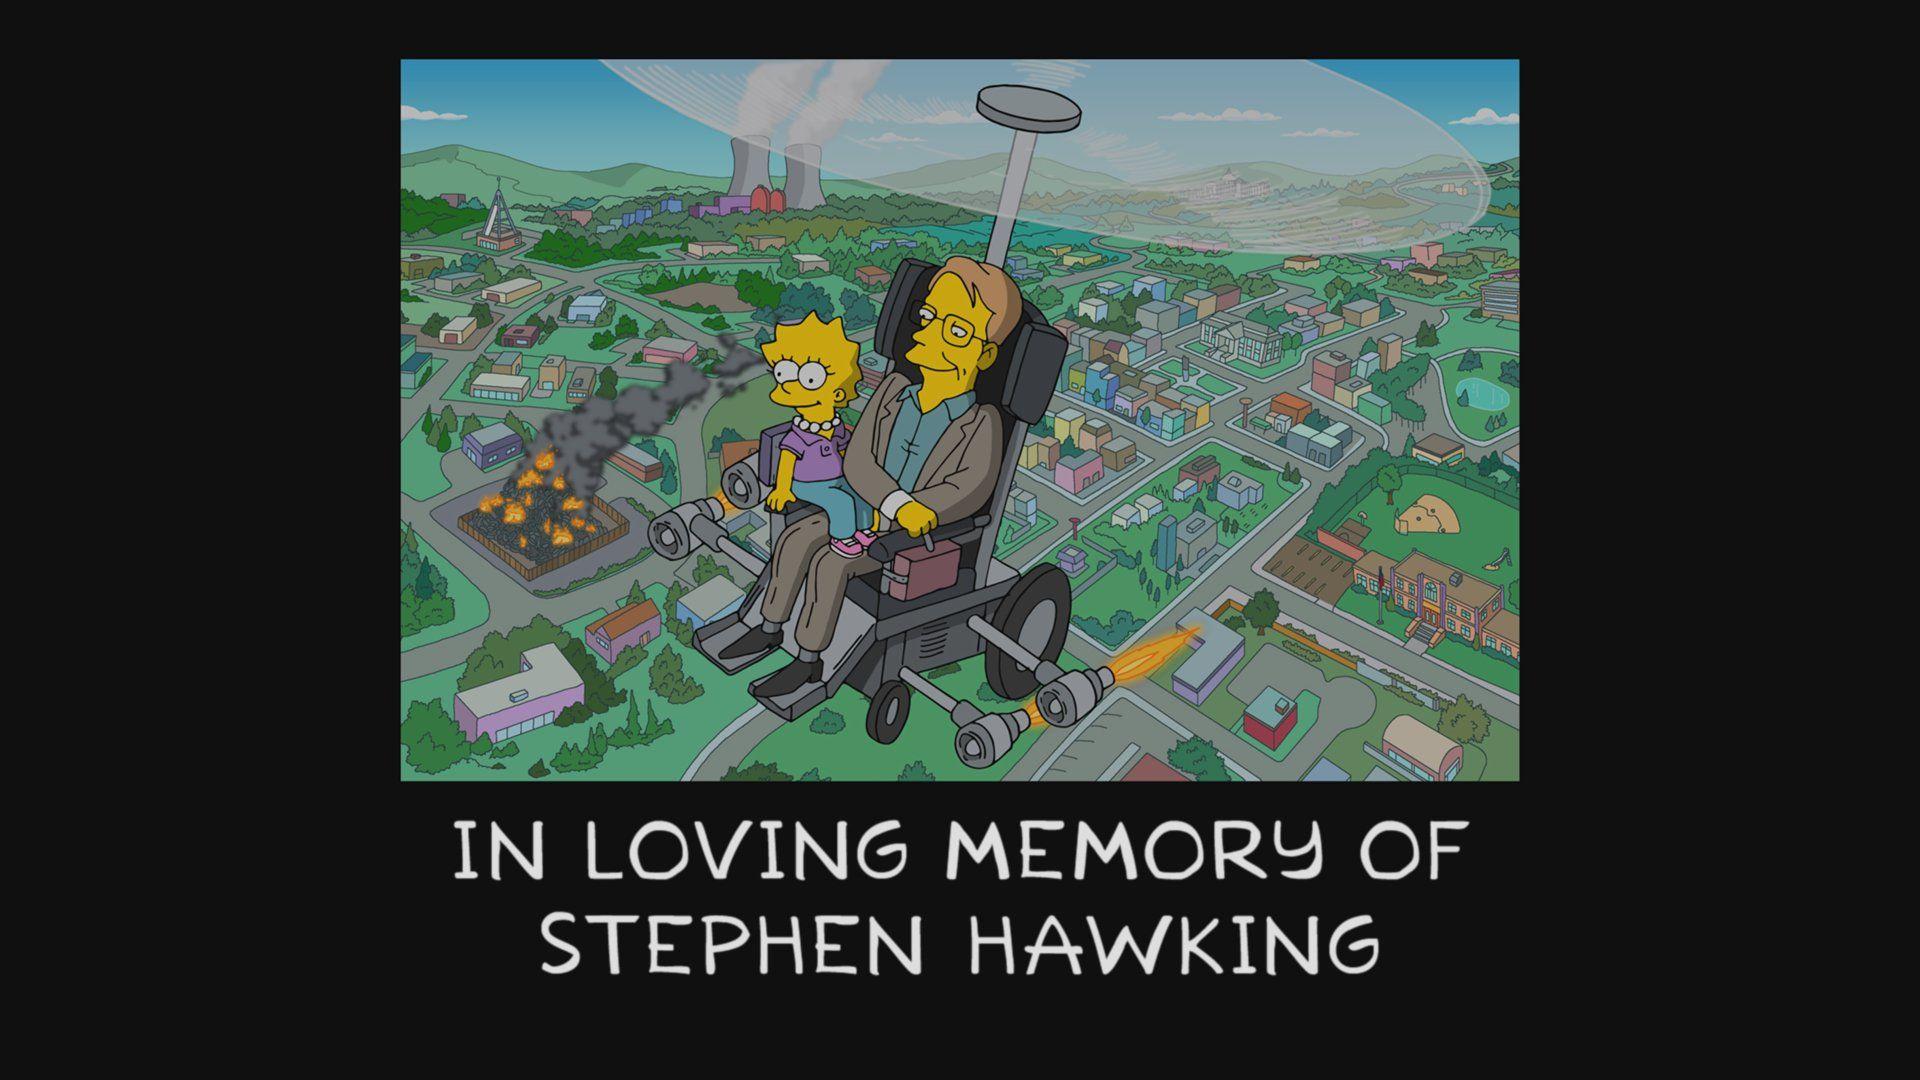 Stephen Hawking tribute on 'The Simpsons'